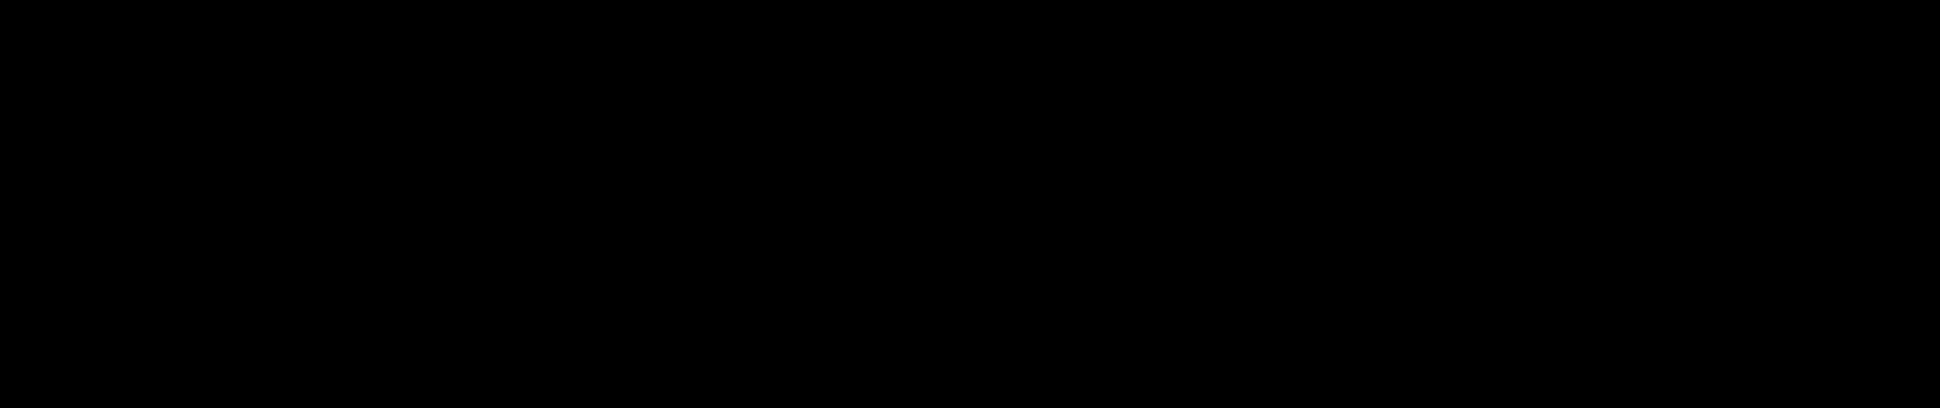 LogoMarinW